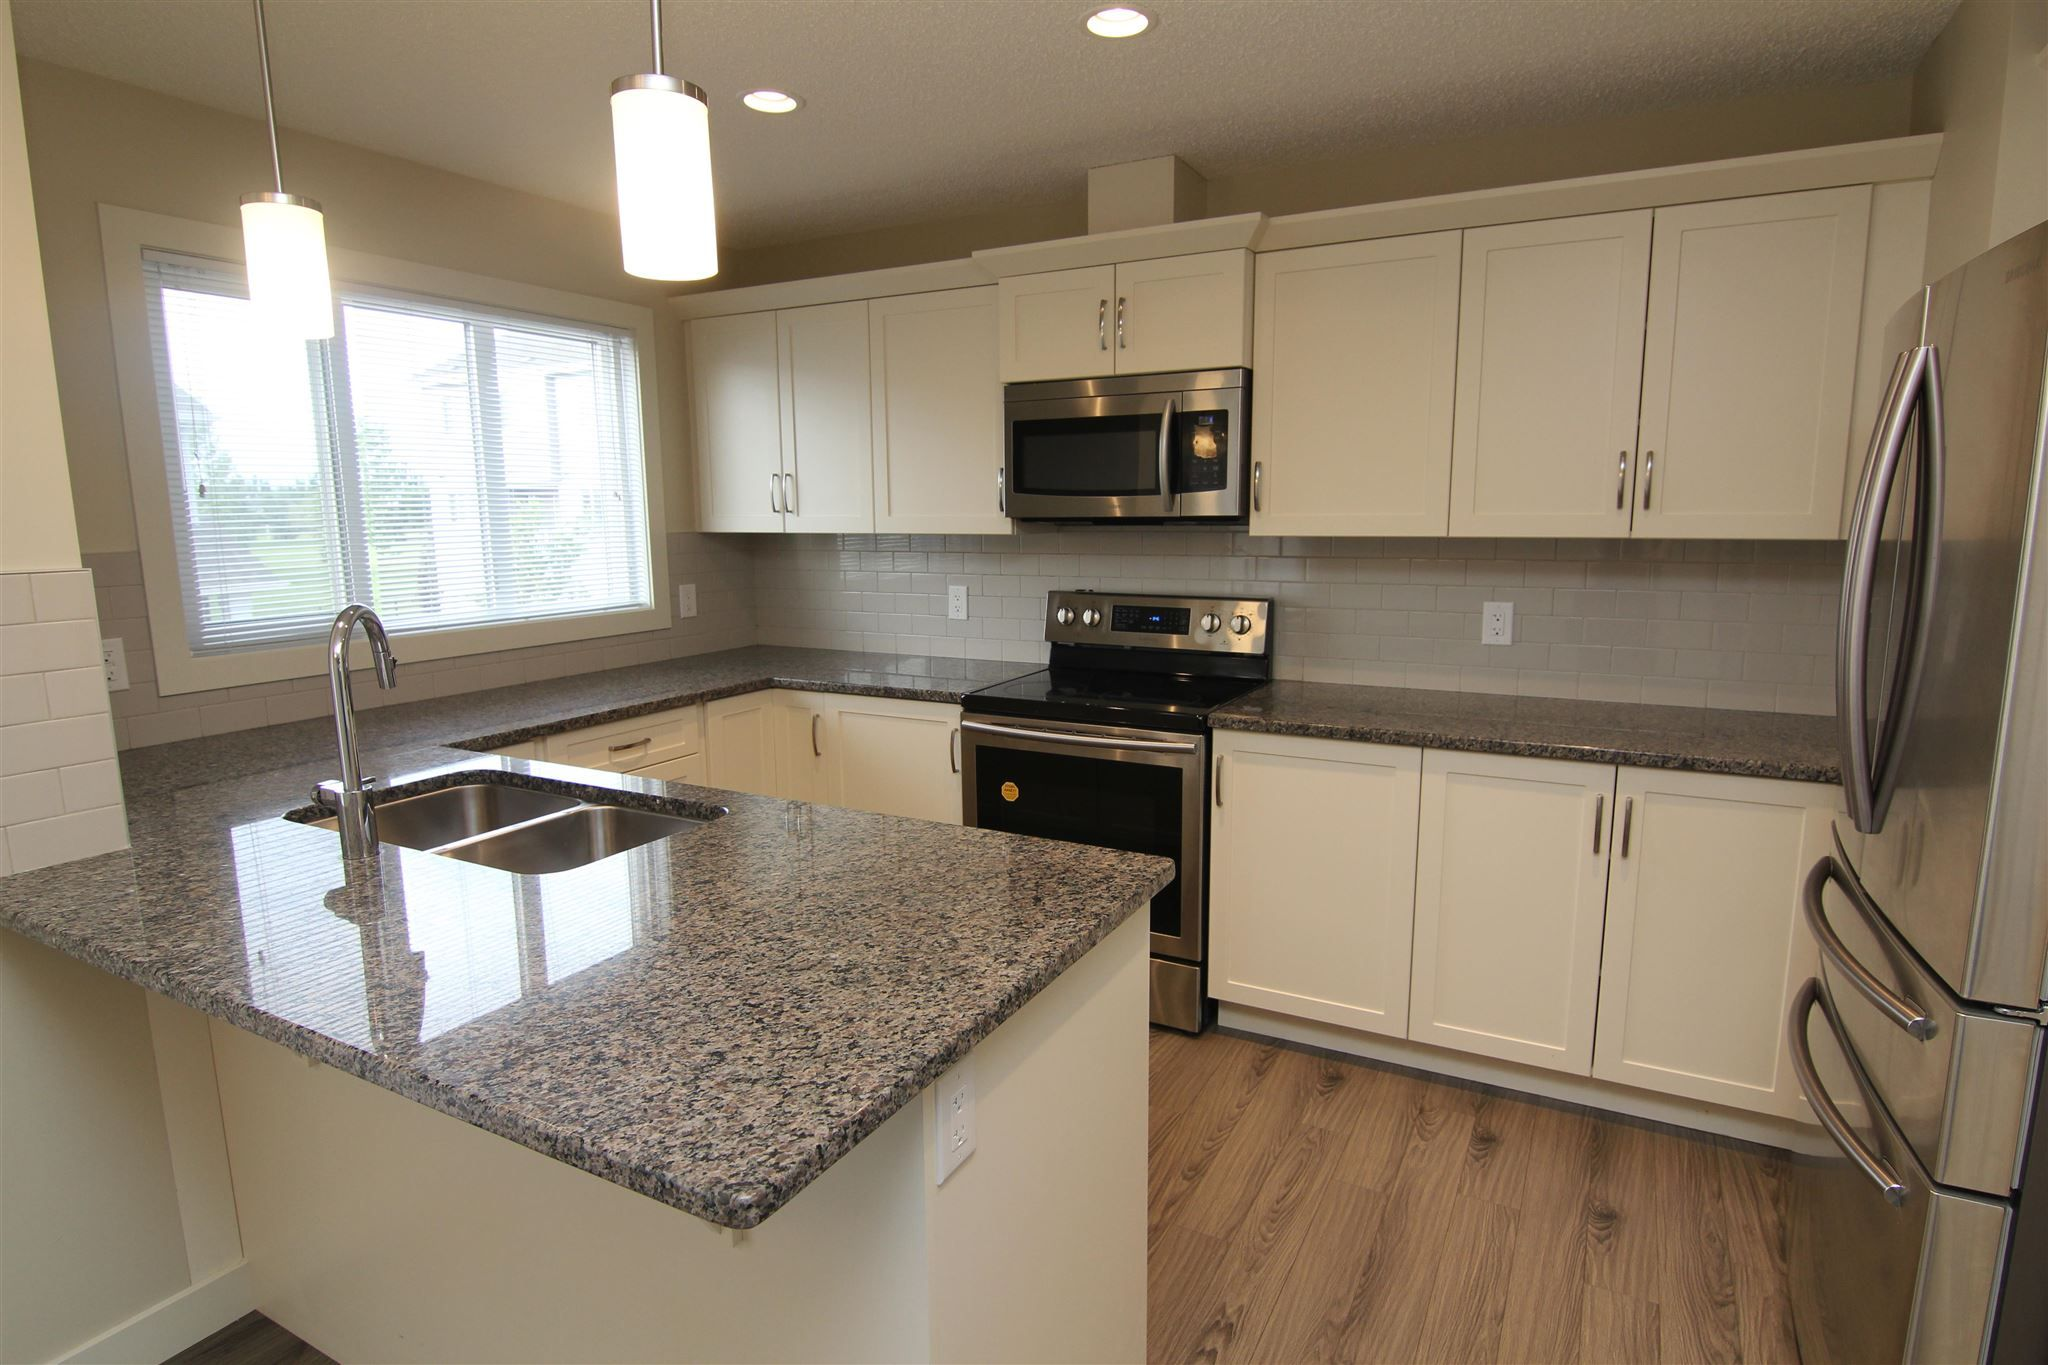 Main Photo: 34 2121 HADDOW Drive in Edmonton: Zone 14 Townhouse for sale : MLS®# E4250446